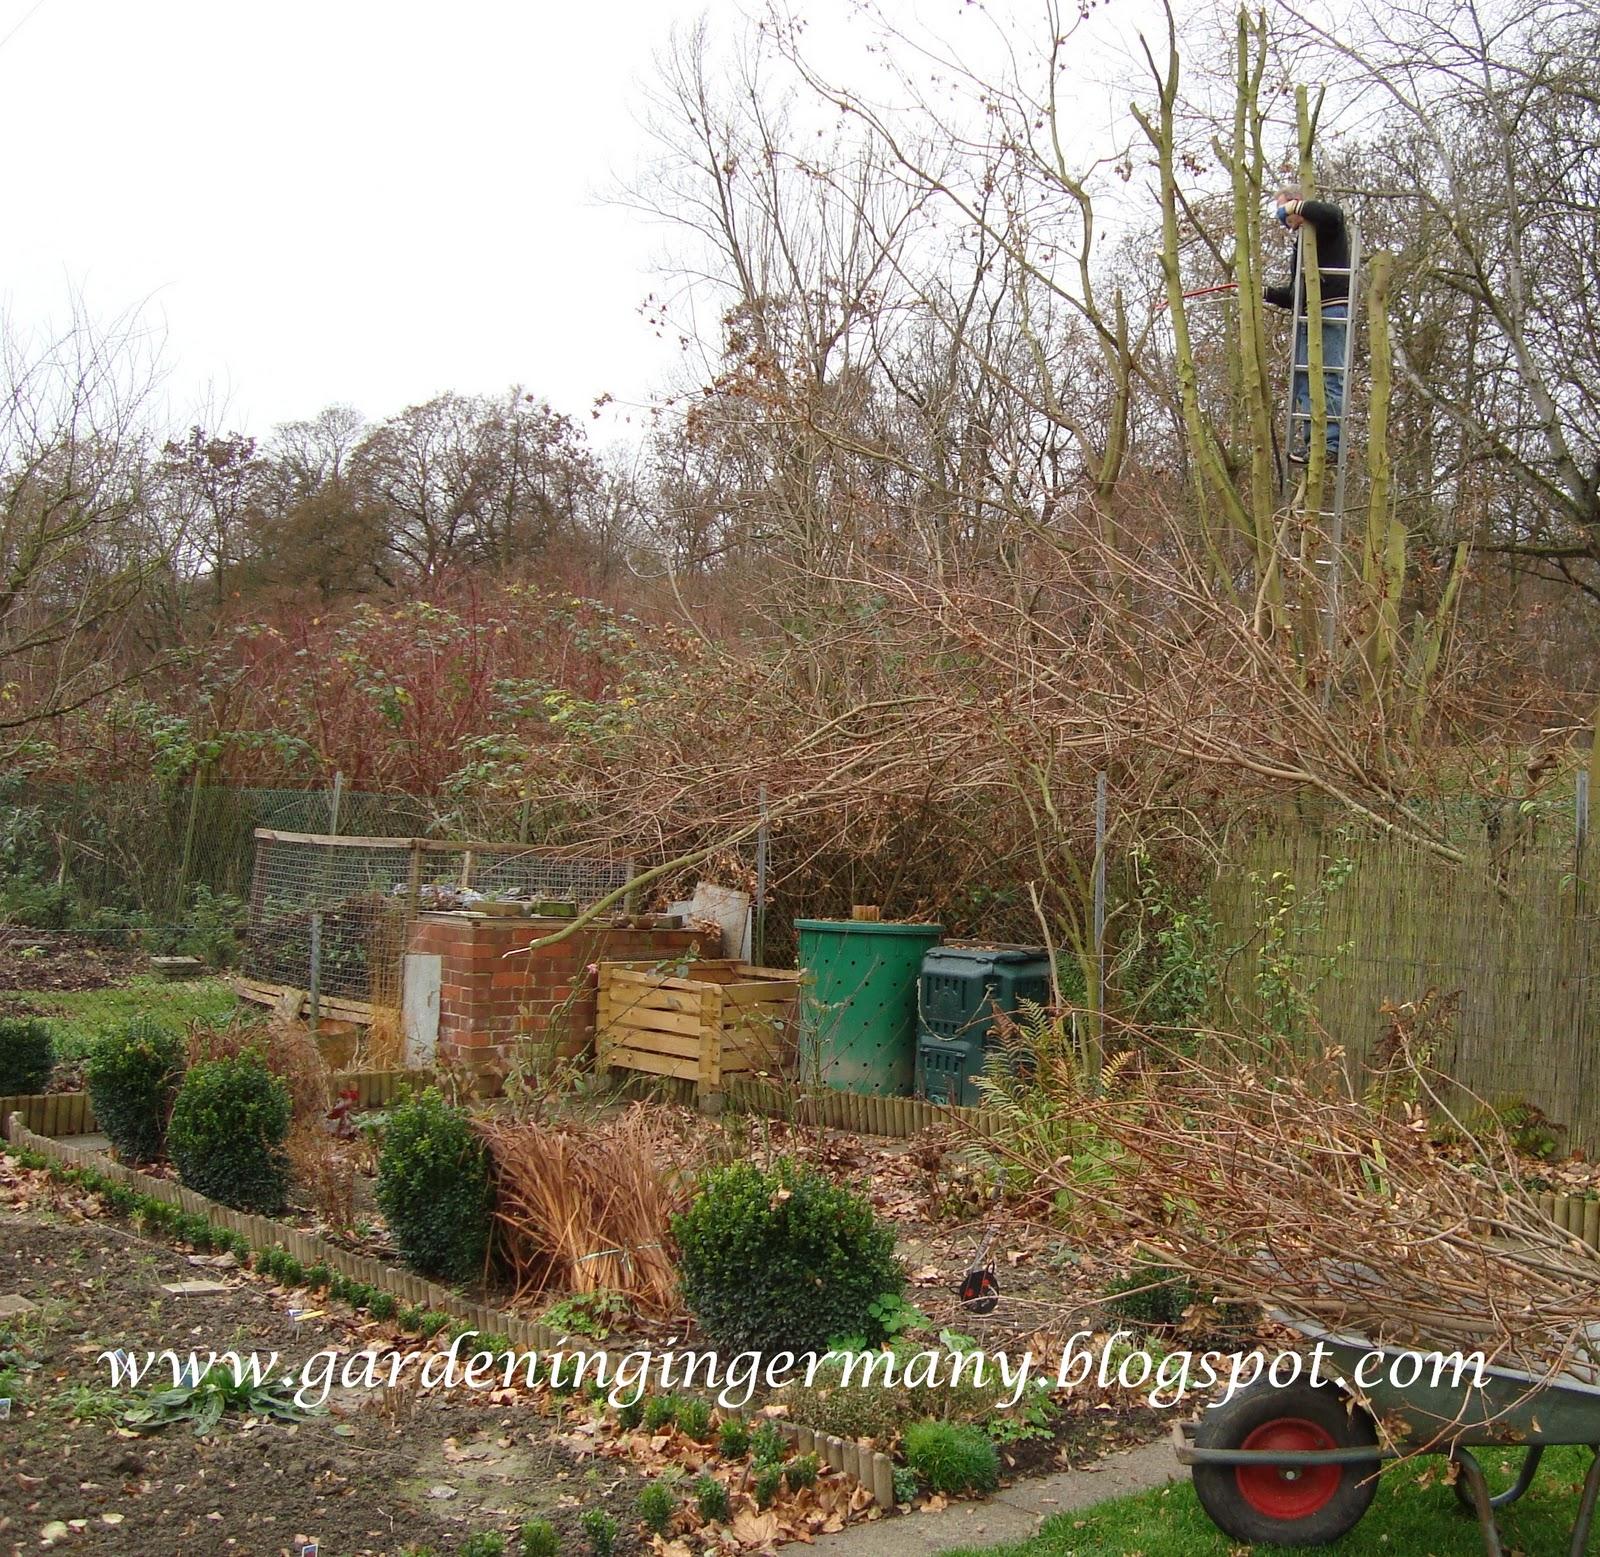 Gardening in Mannheim, Germany: December 2010